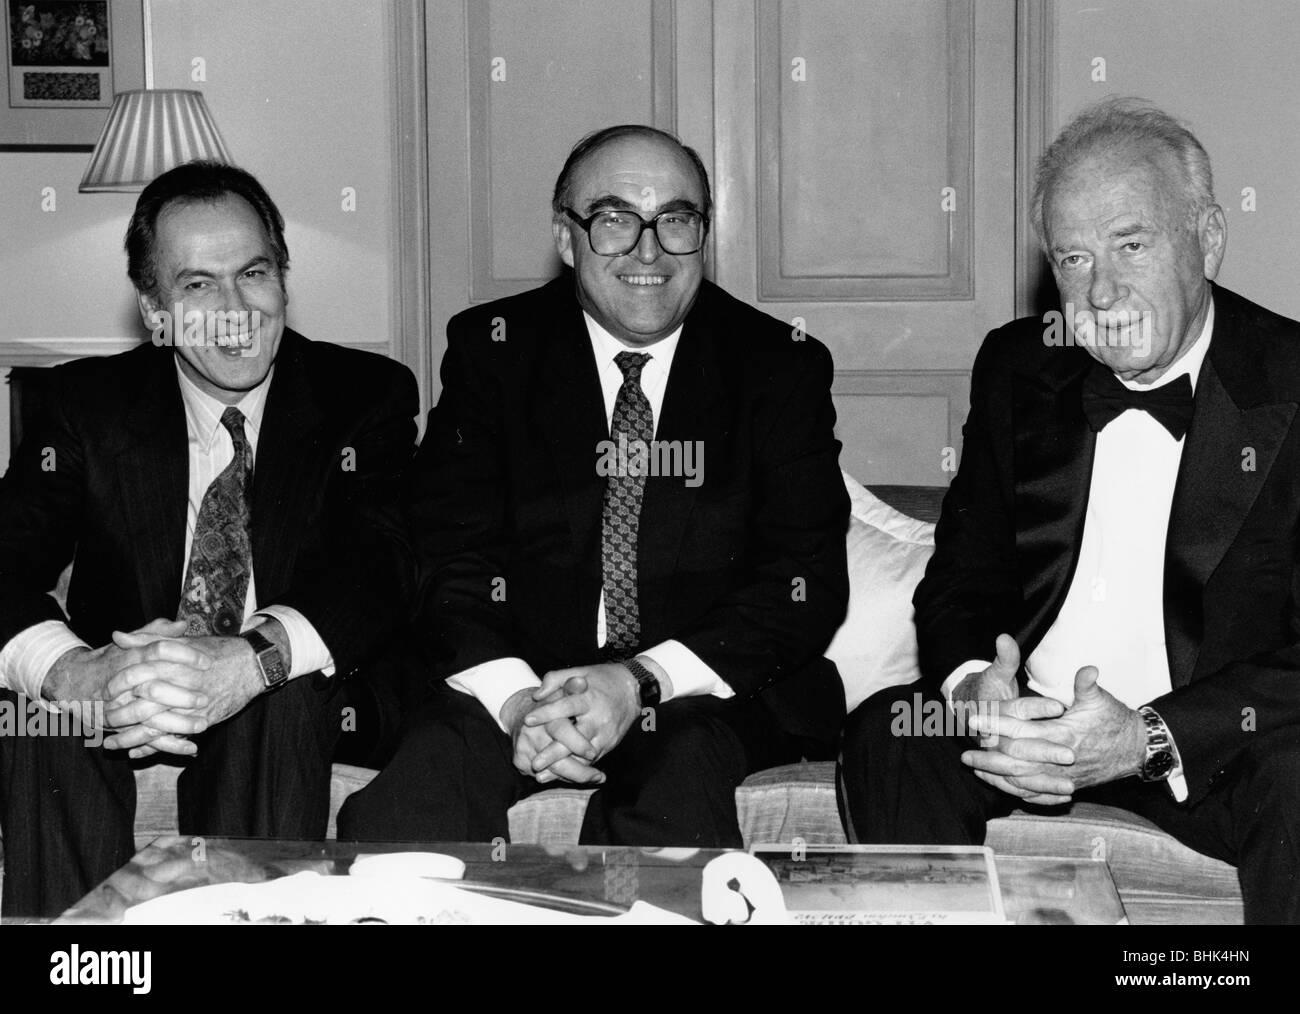 Jack Cunningham, MP, John Smith, Labour Party leader, Yitzhak Rabin, Israeli Prime Minister, 1992. Artist: Sidney - Stock Image